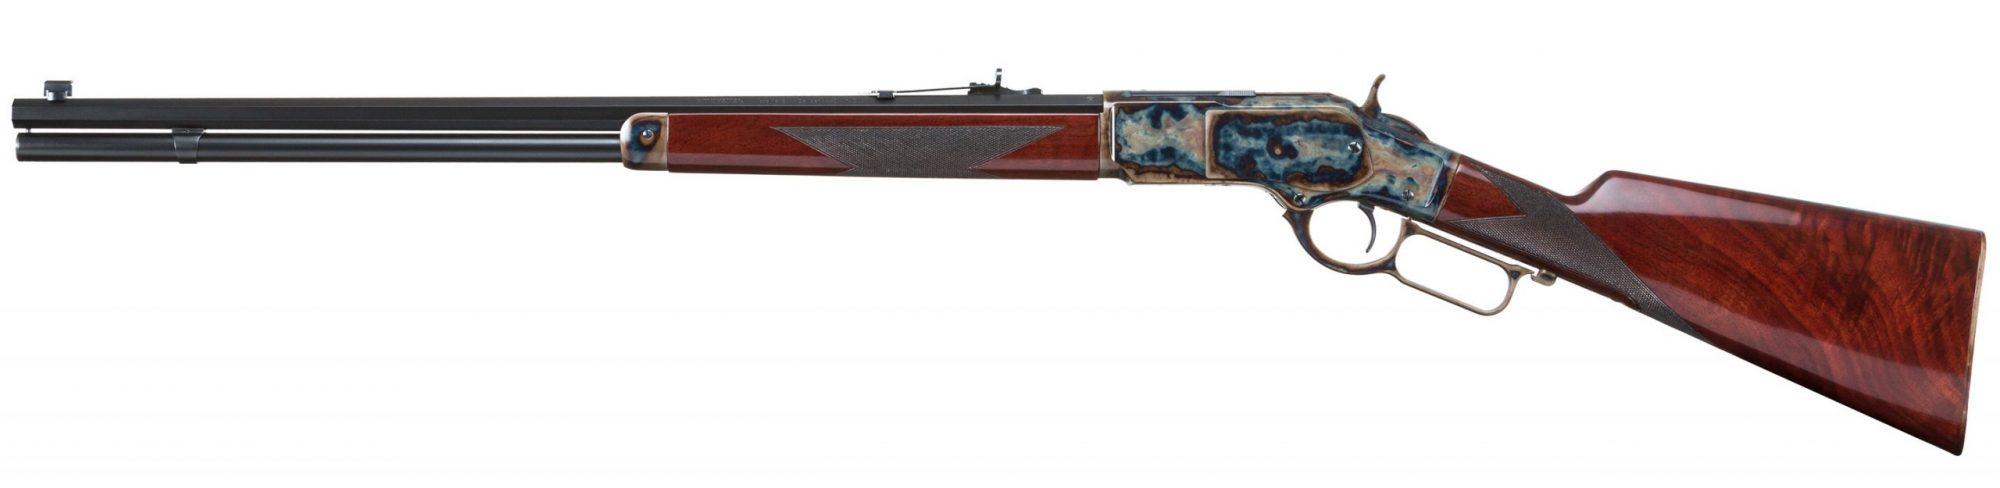 6305 Turnbull Winchester 1873 44 00052ZT73Y